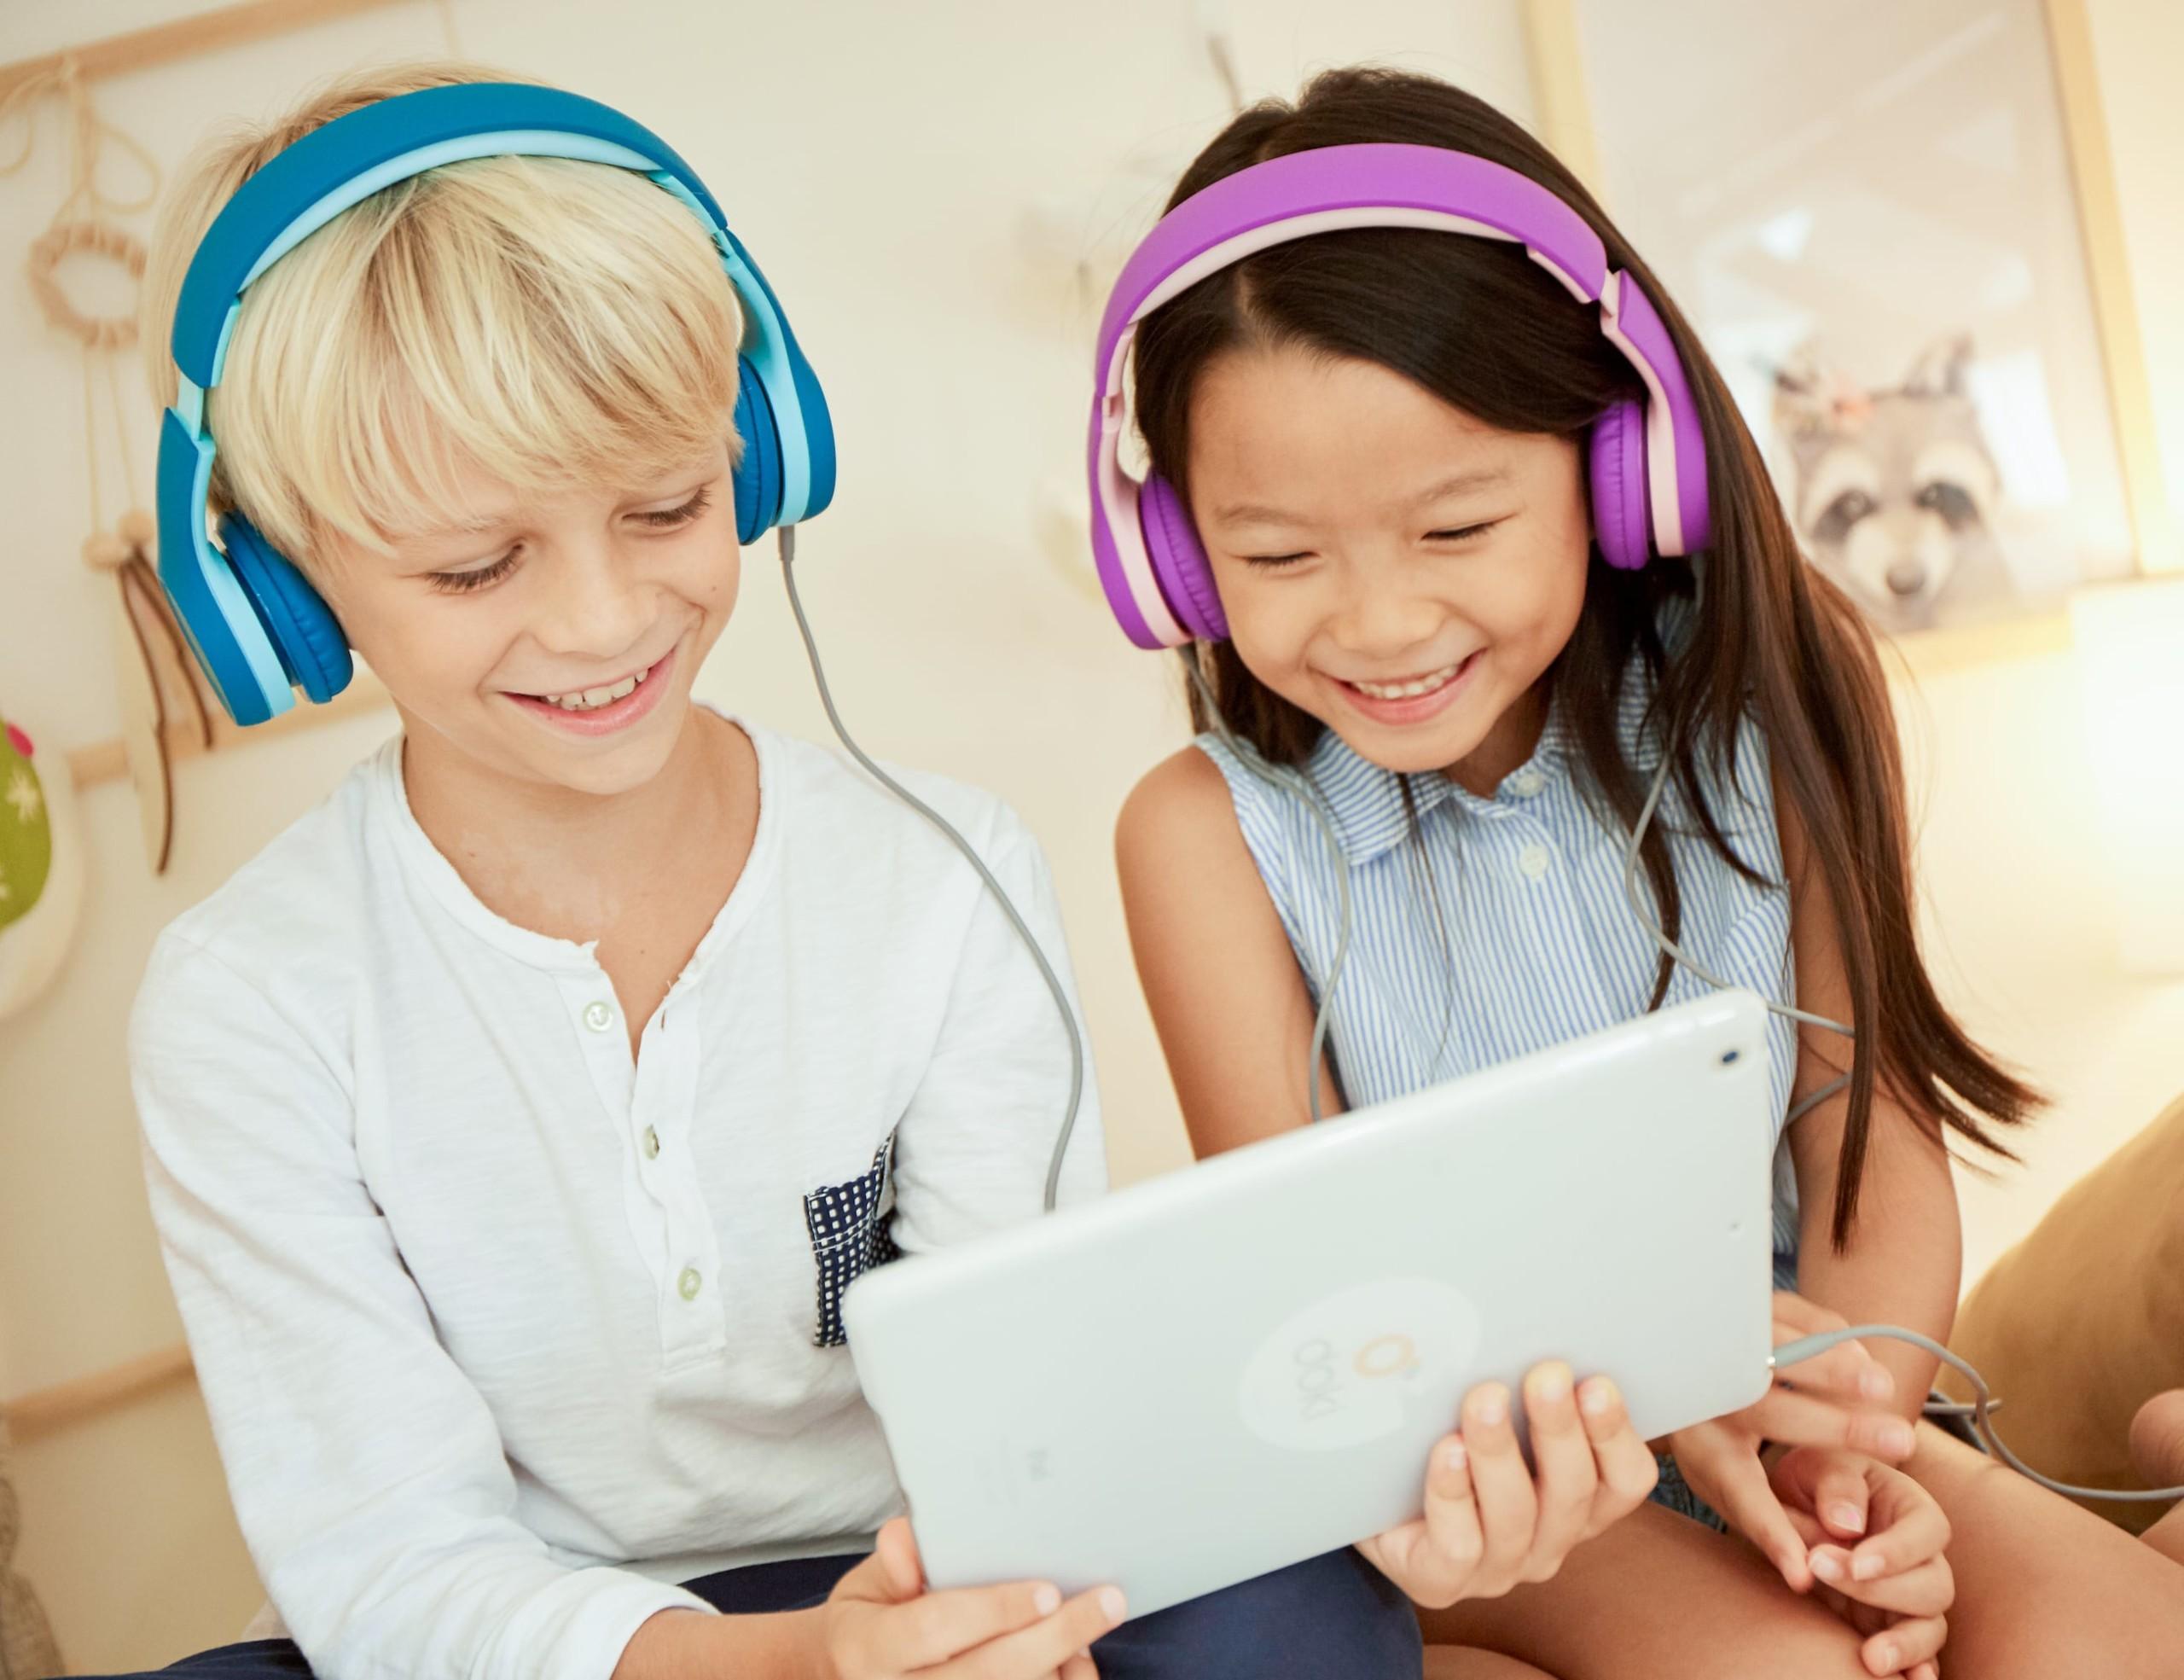 dokiBop Kids Wired On-Ear Headphones